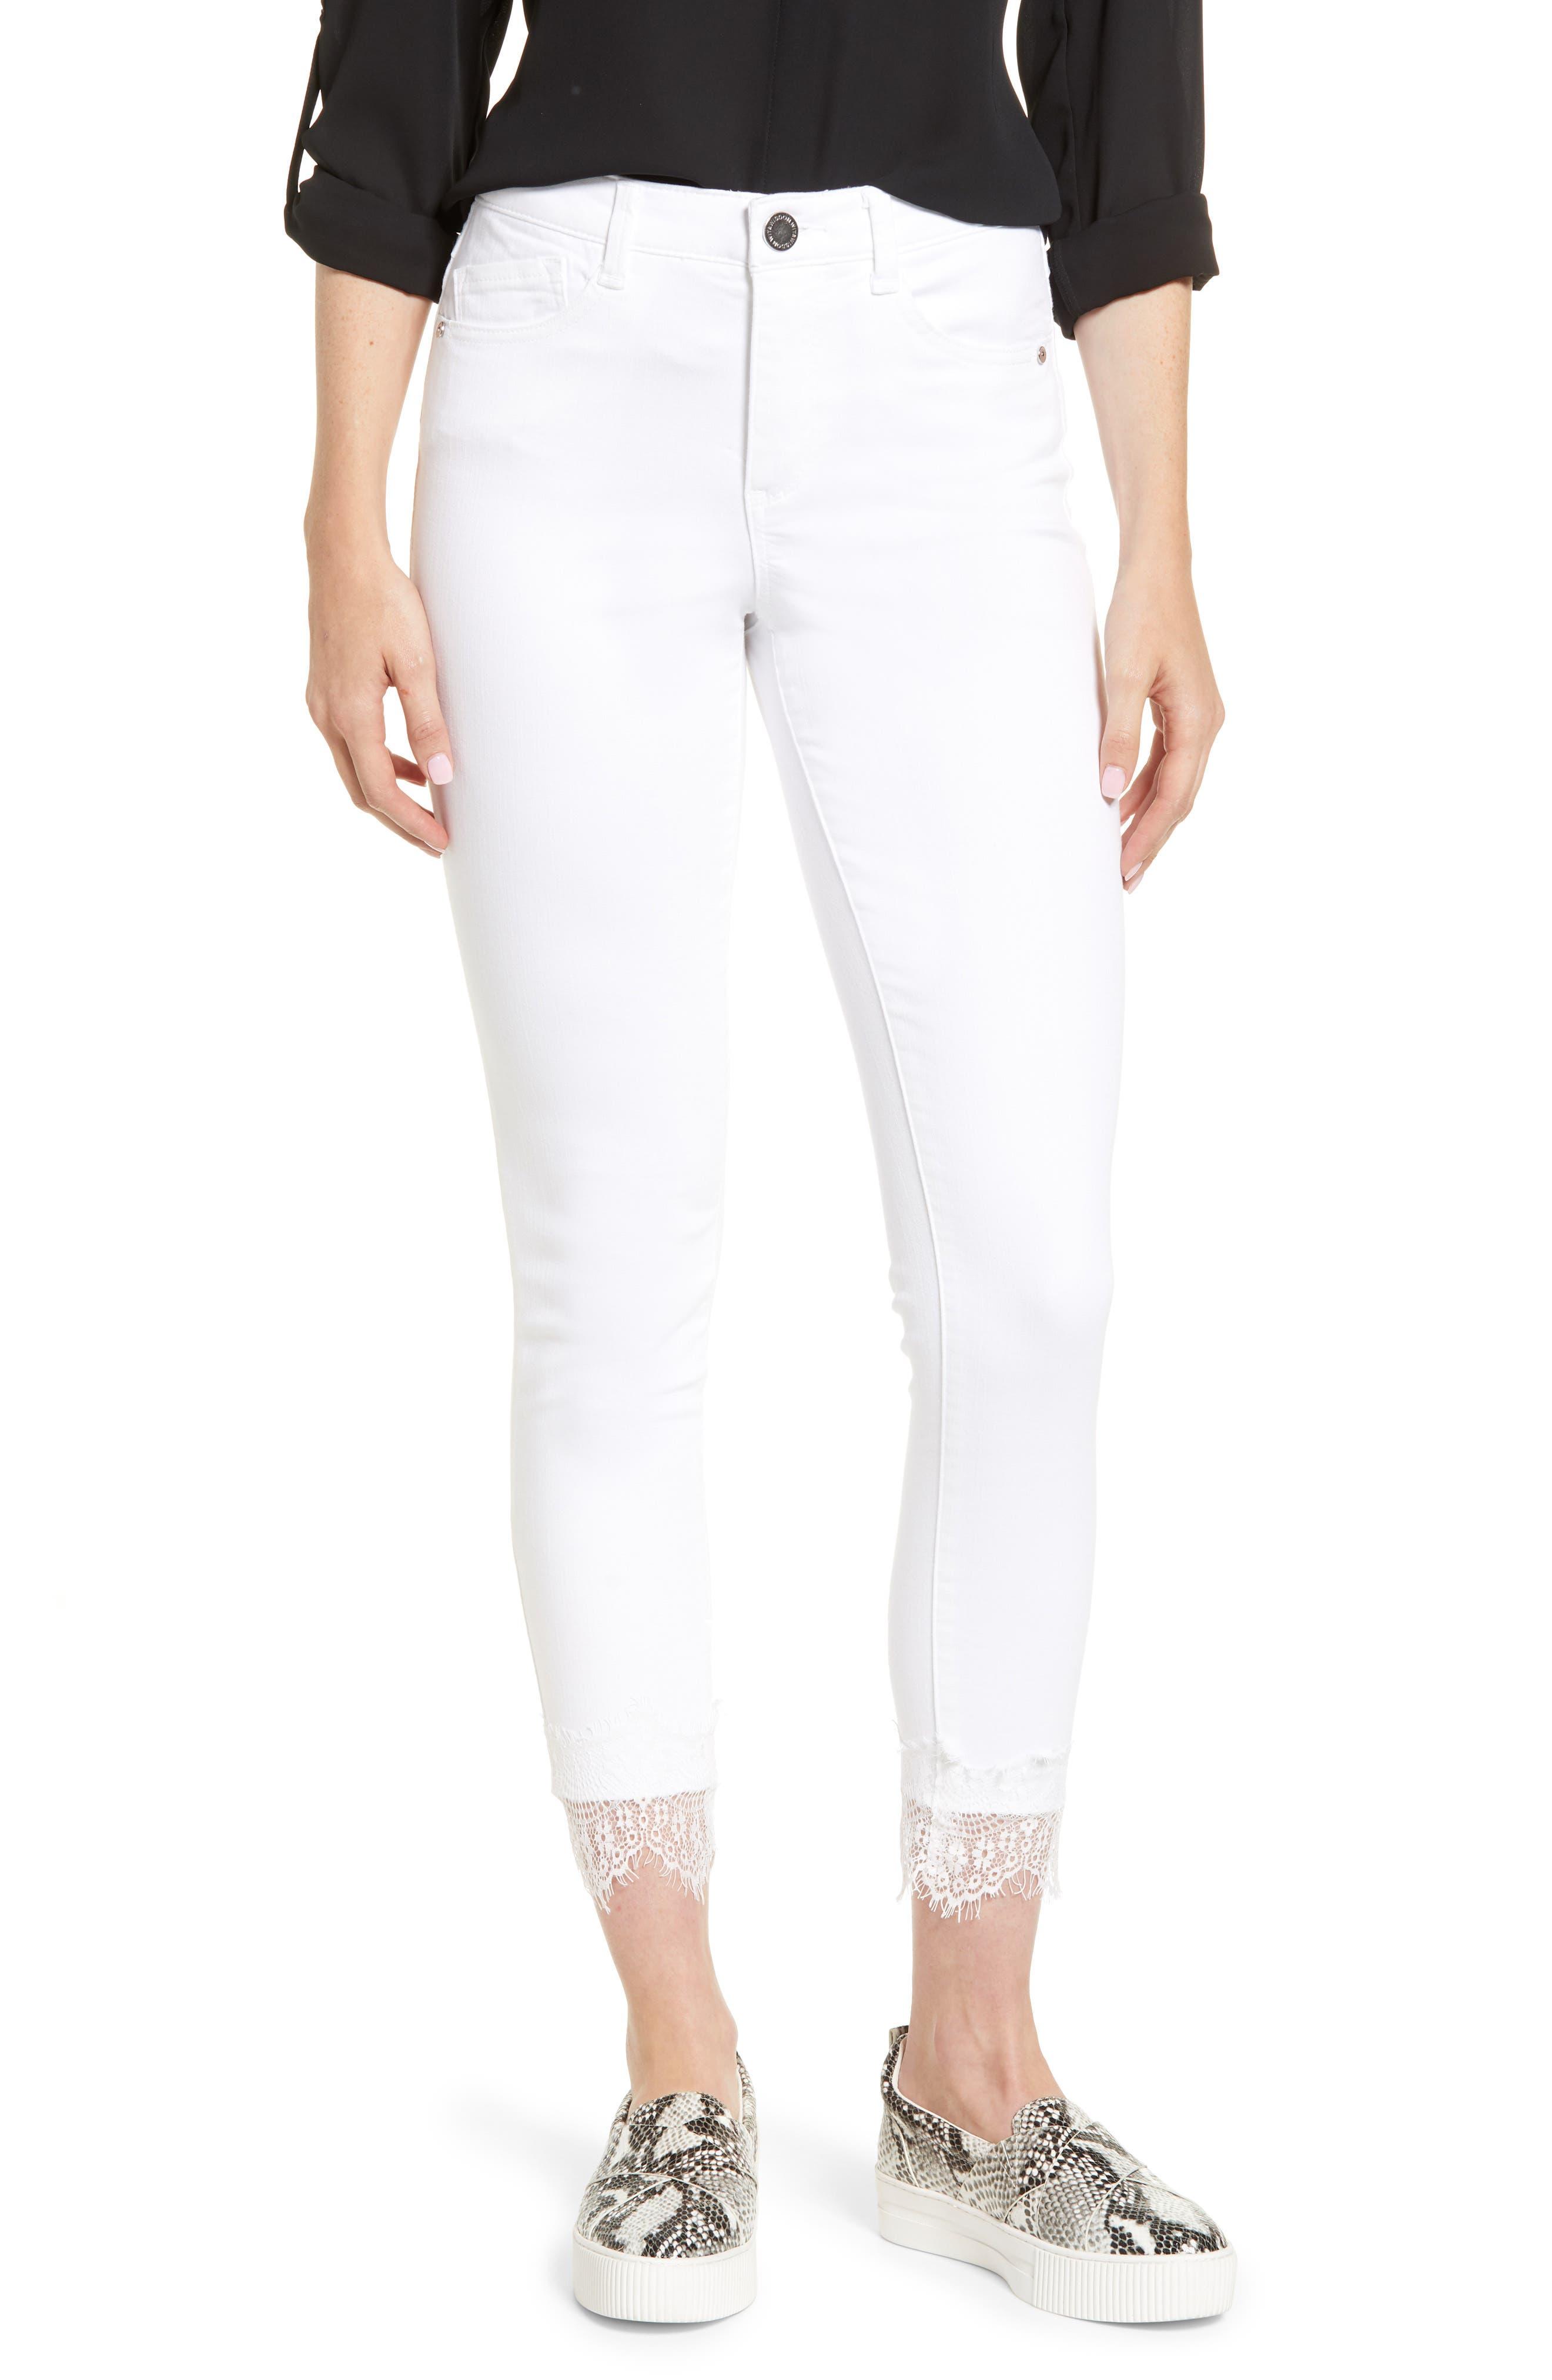 WIT & WISDOM, Ab-Solution Lace Hem High Waist Jeans, Main thumbnail 1, color, OPTIC WHITE